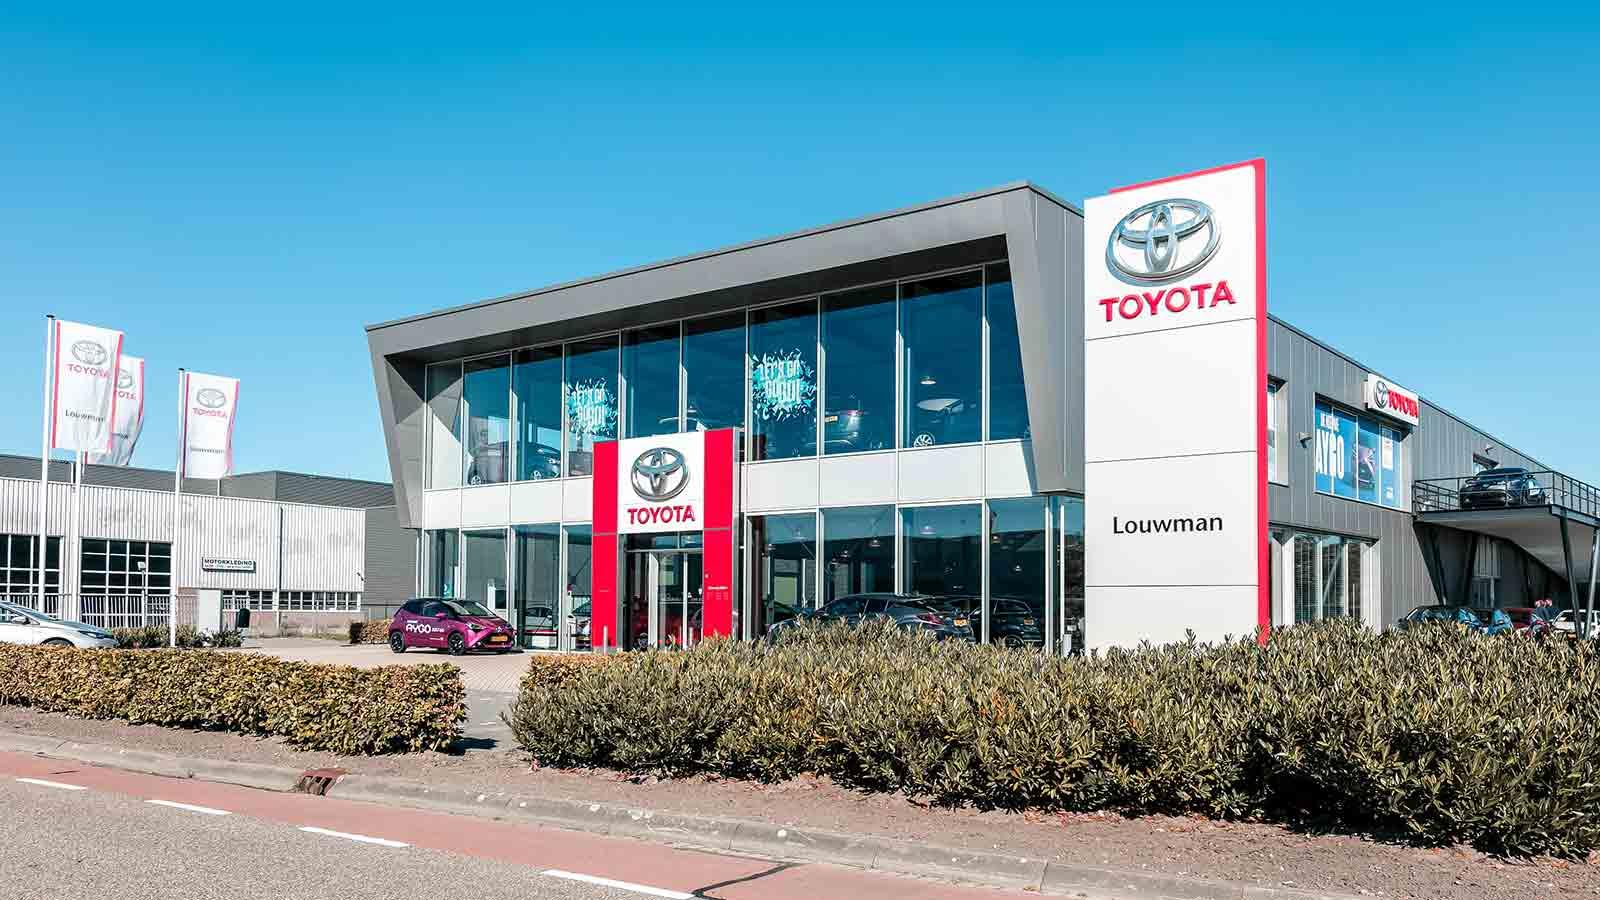 Louwman Toyota Rijen